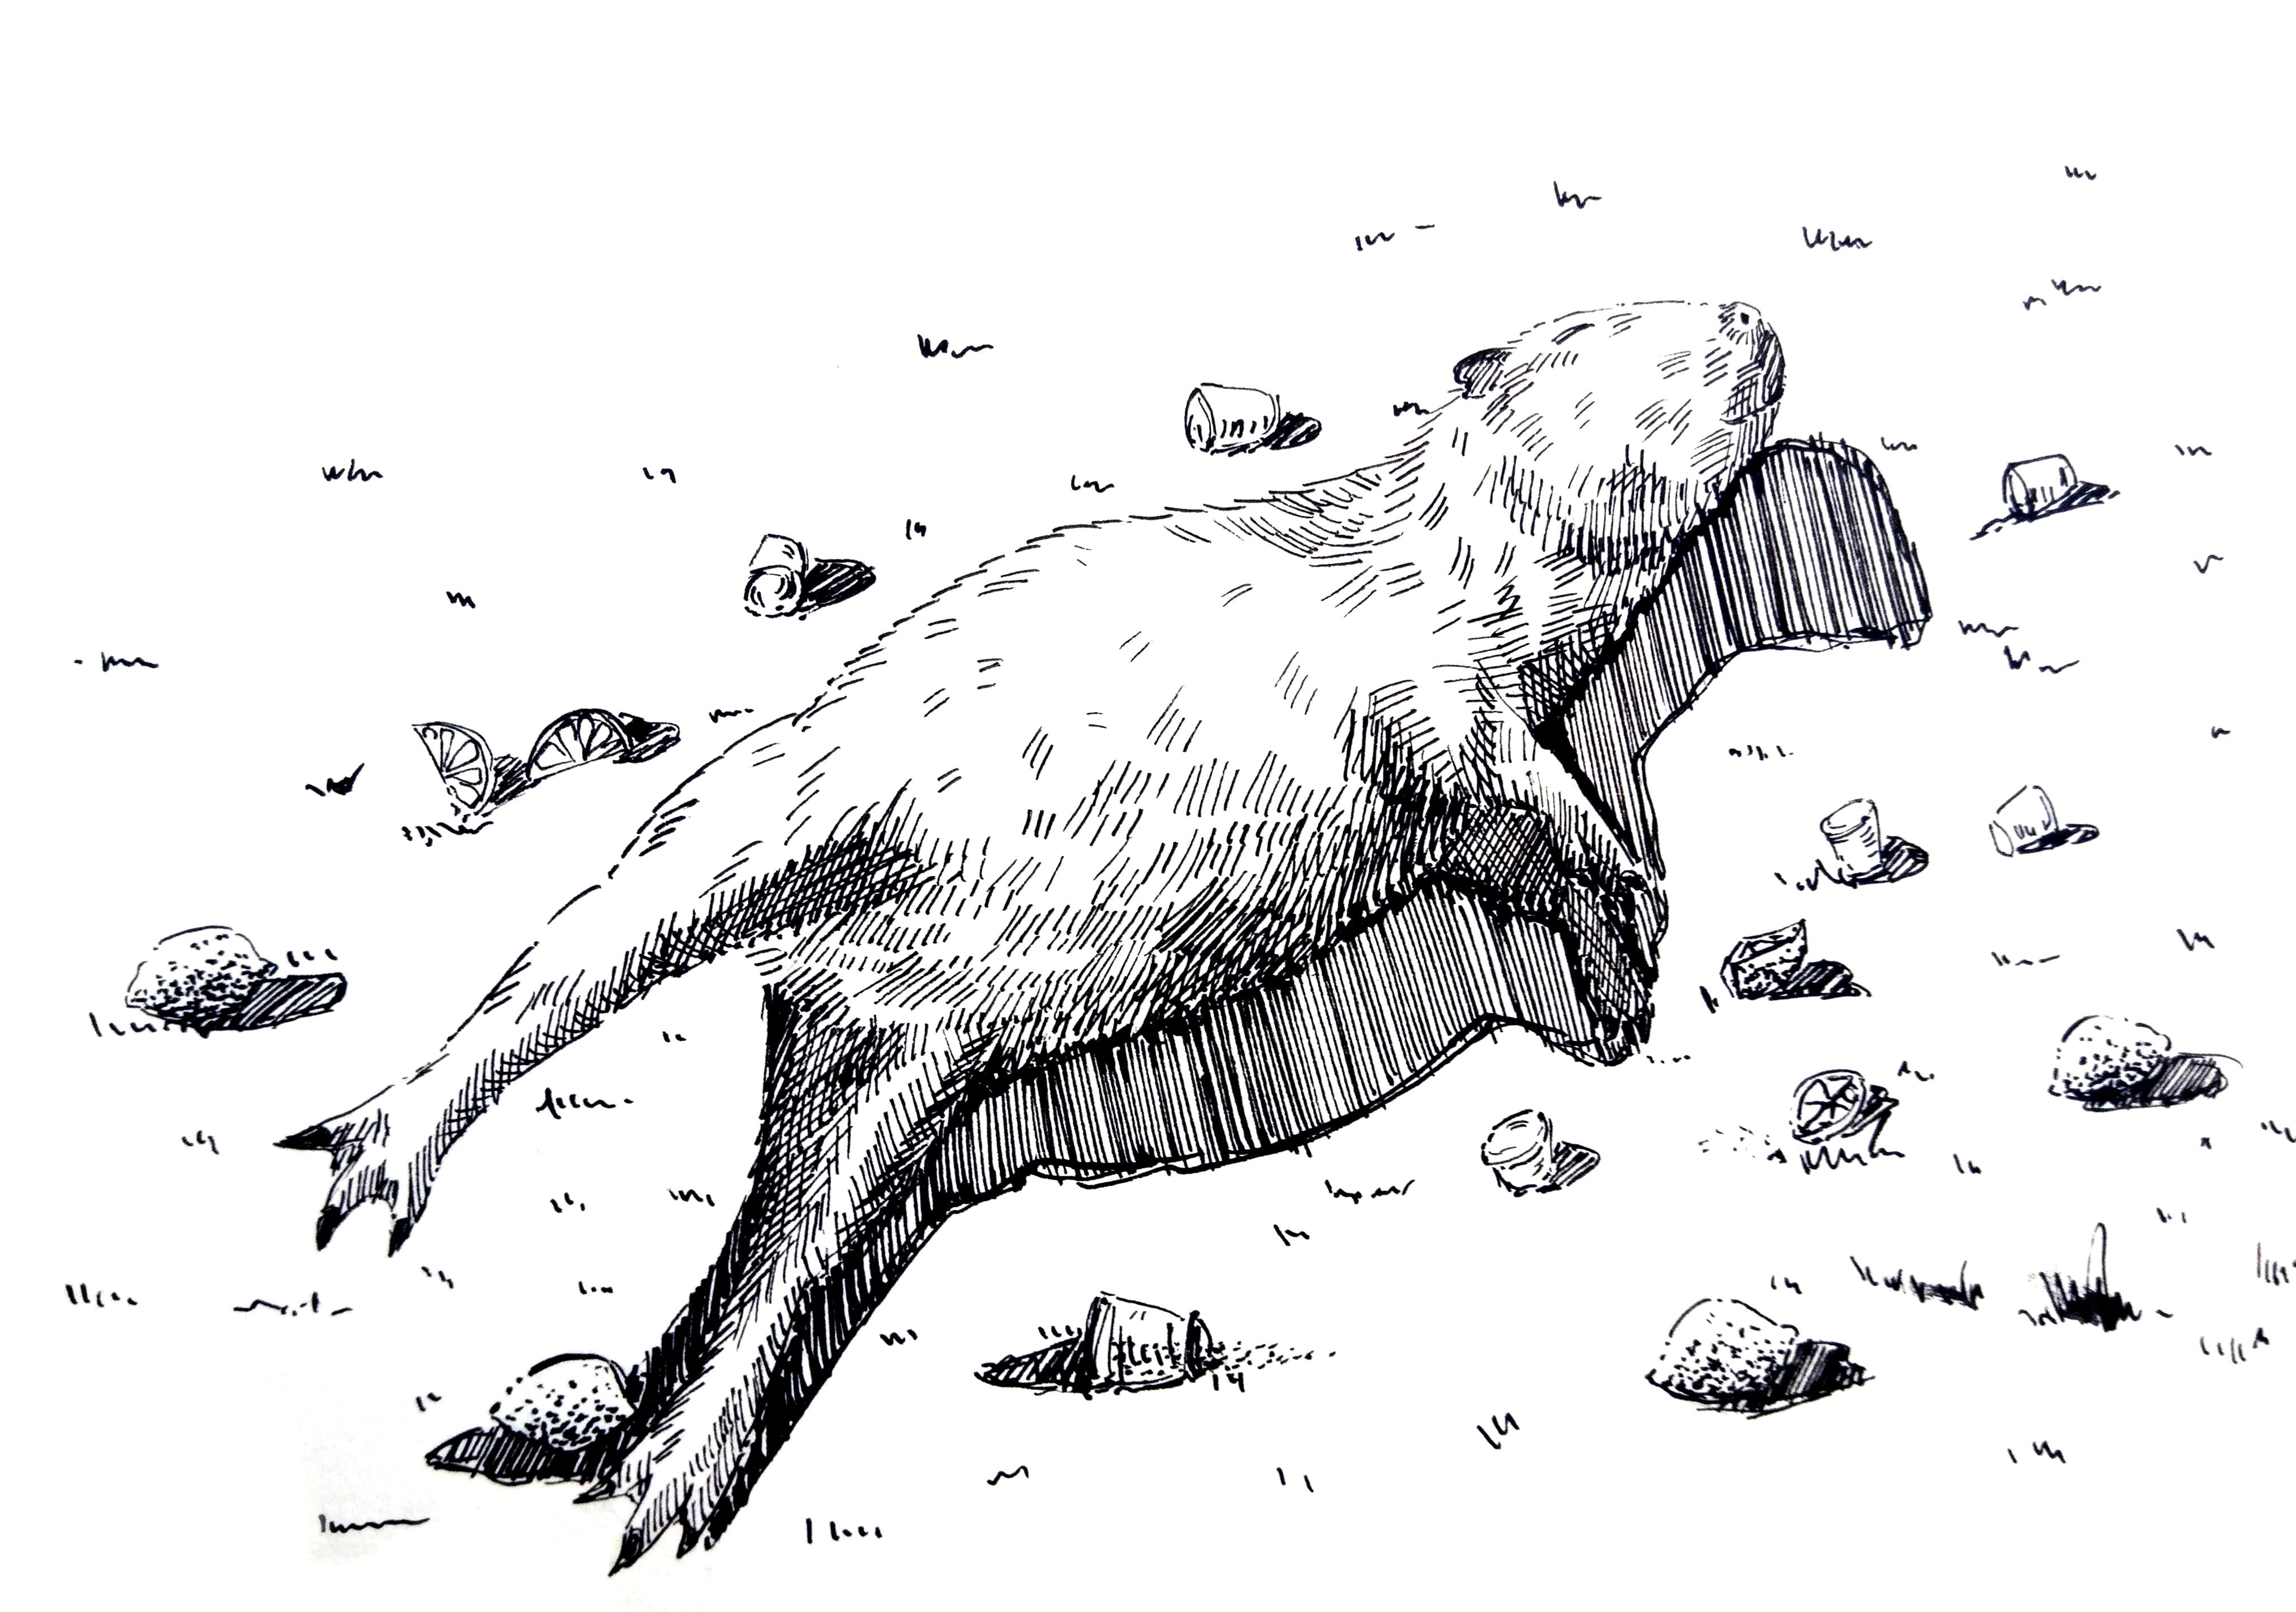 201226-capybara-tequila-Melanie Franz